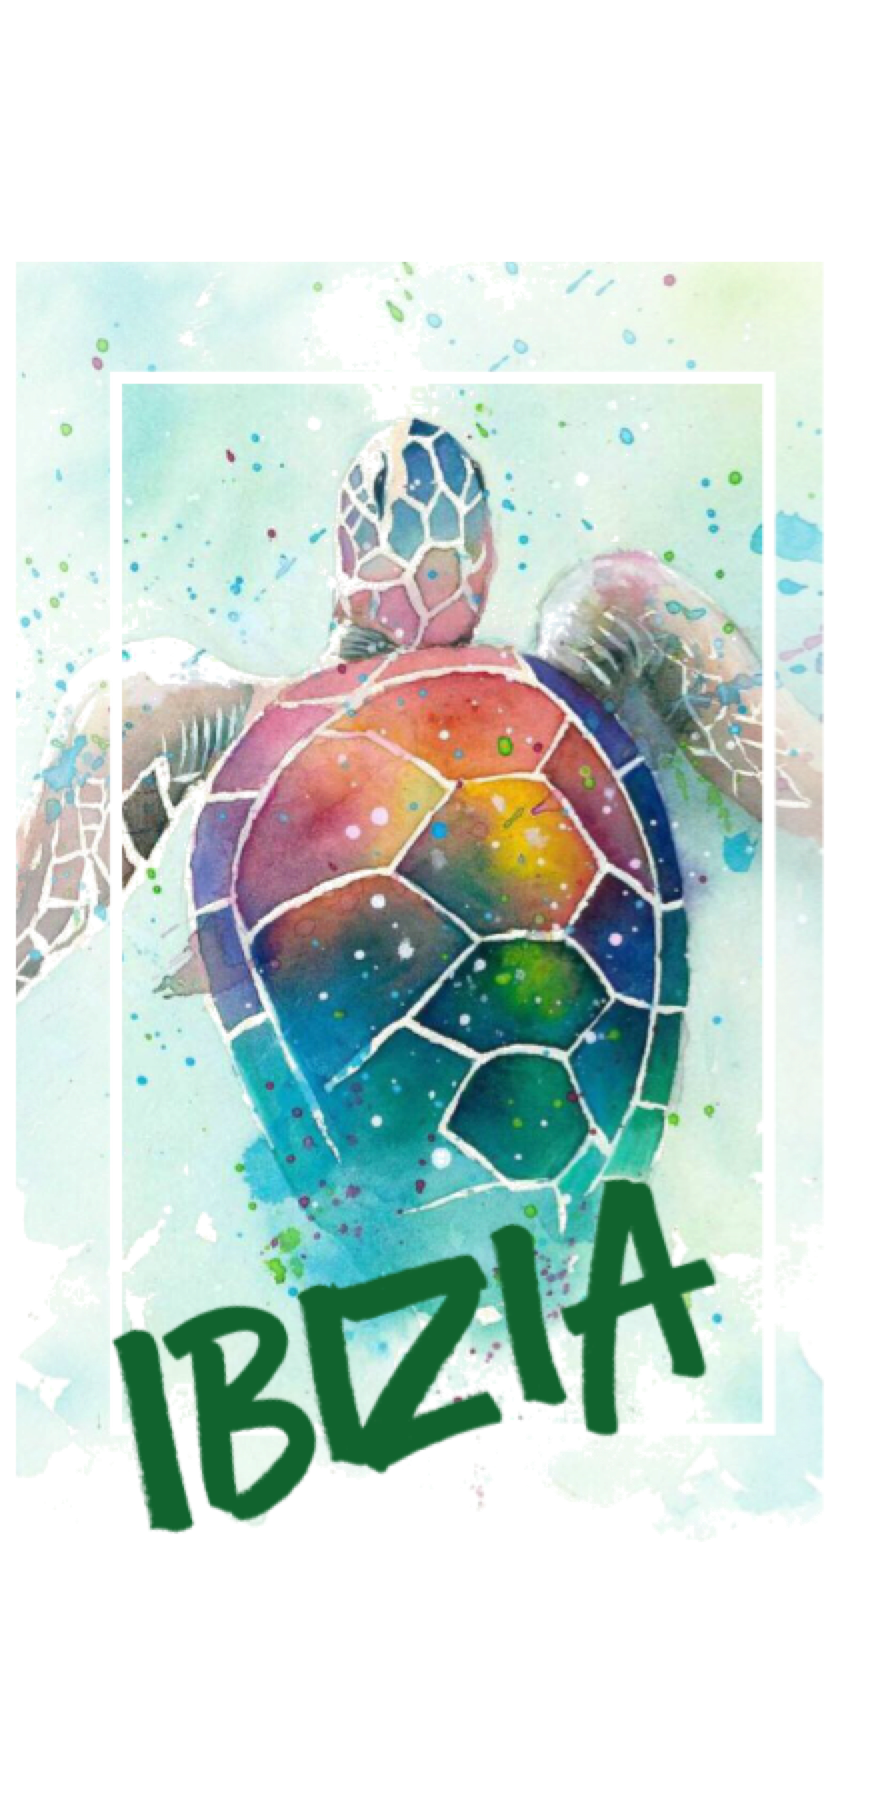 cover #ibizia